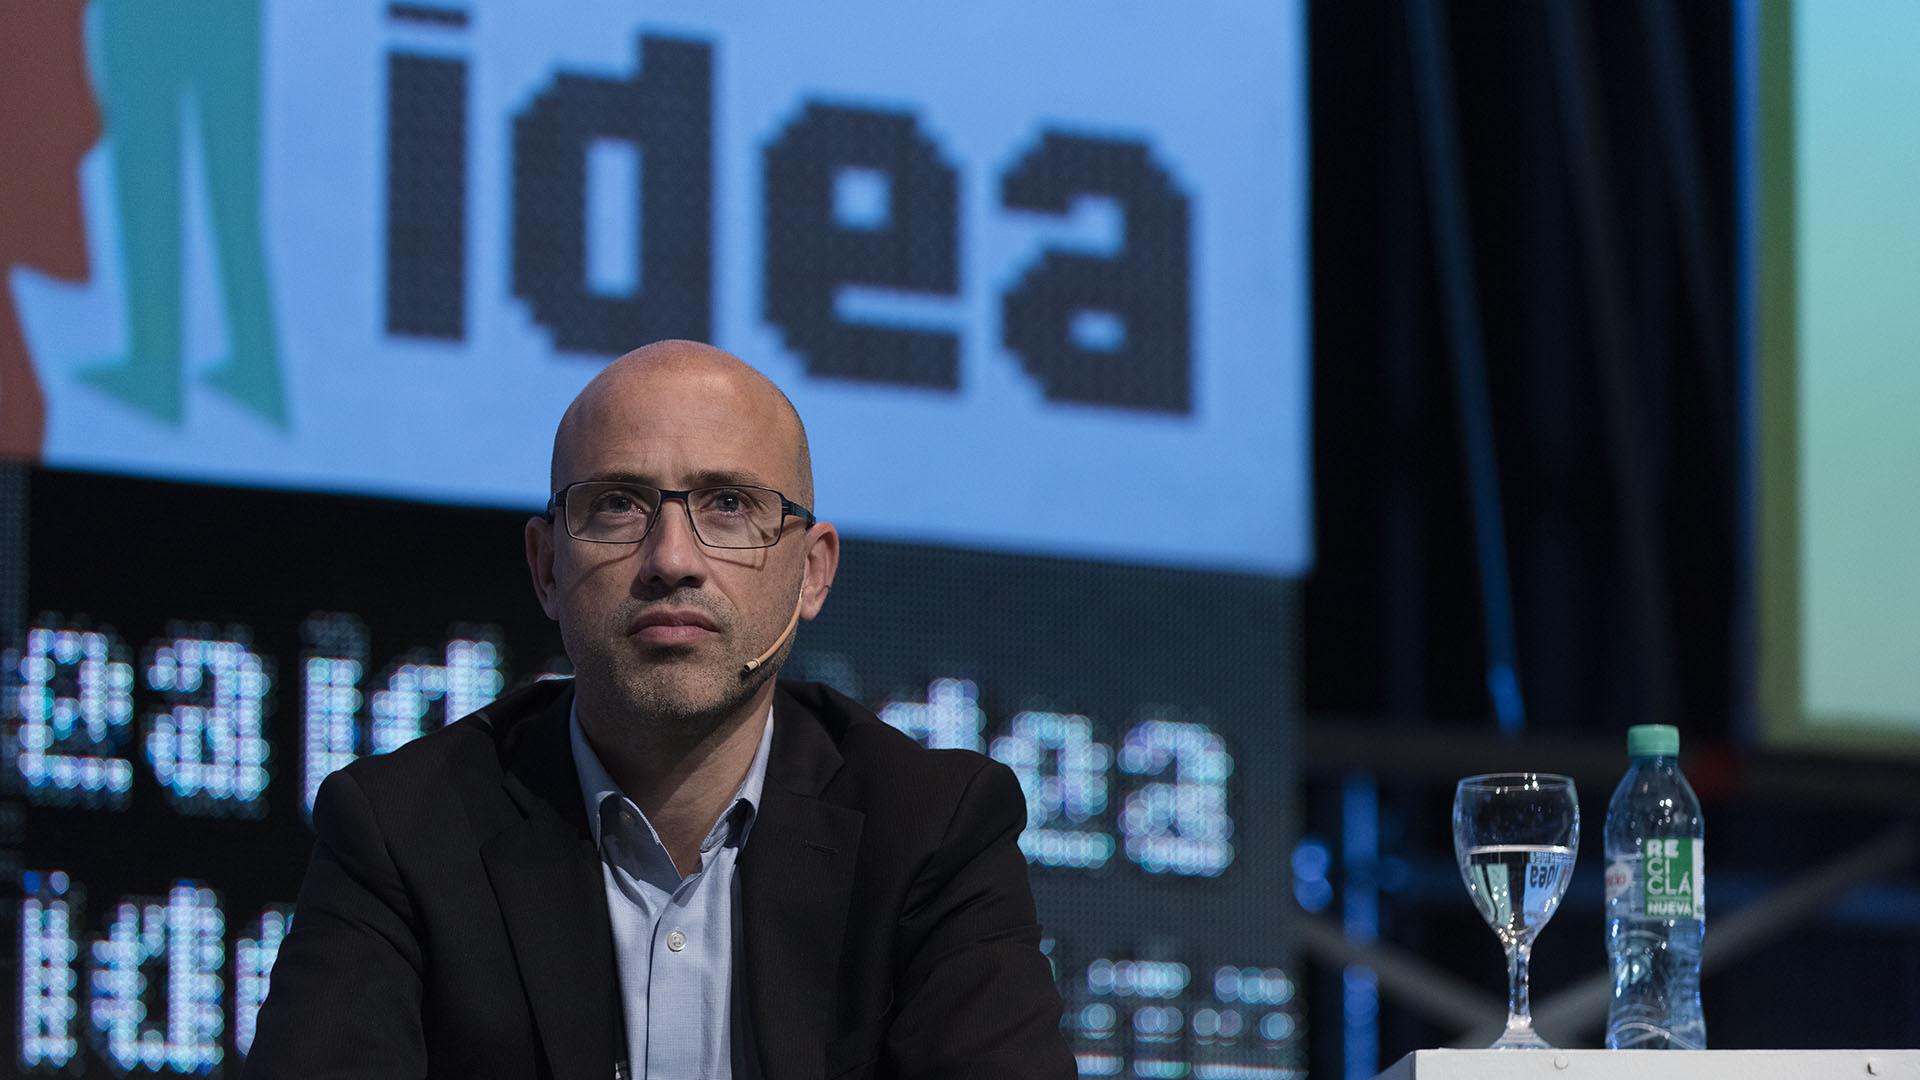 Juan Pablo Lafosse, CEO de almundo.com